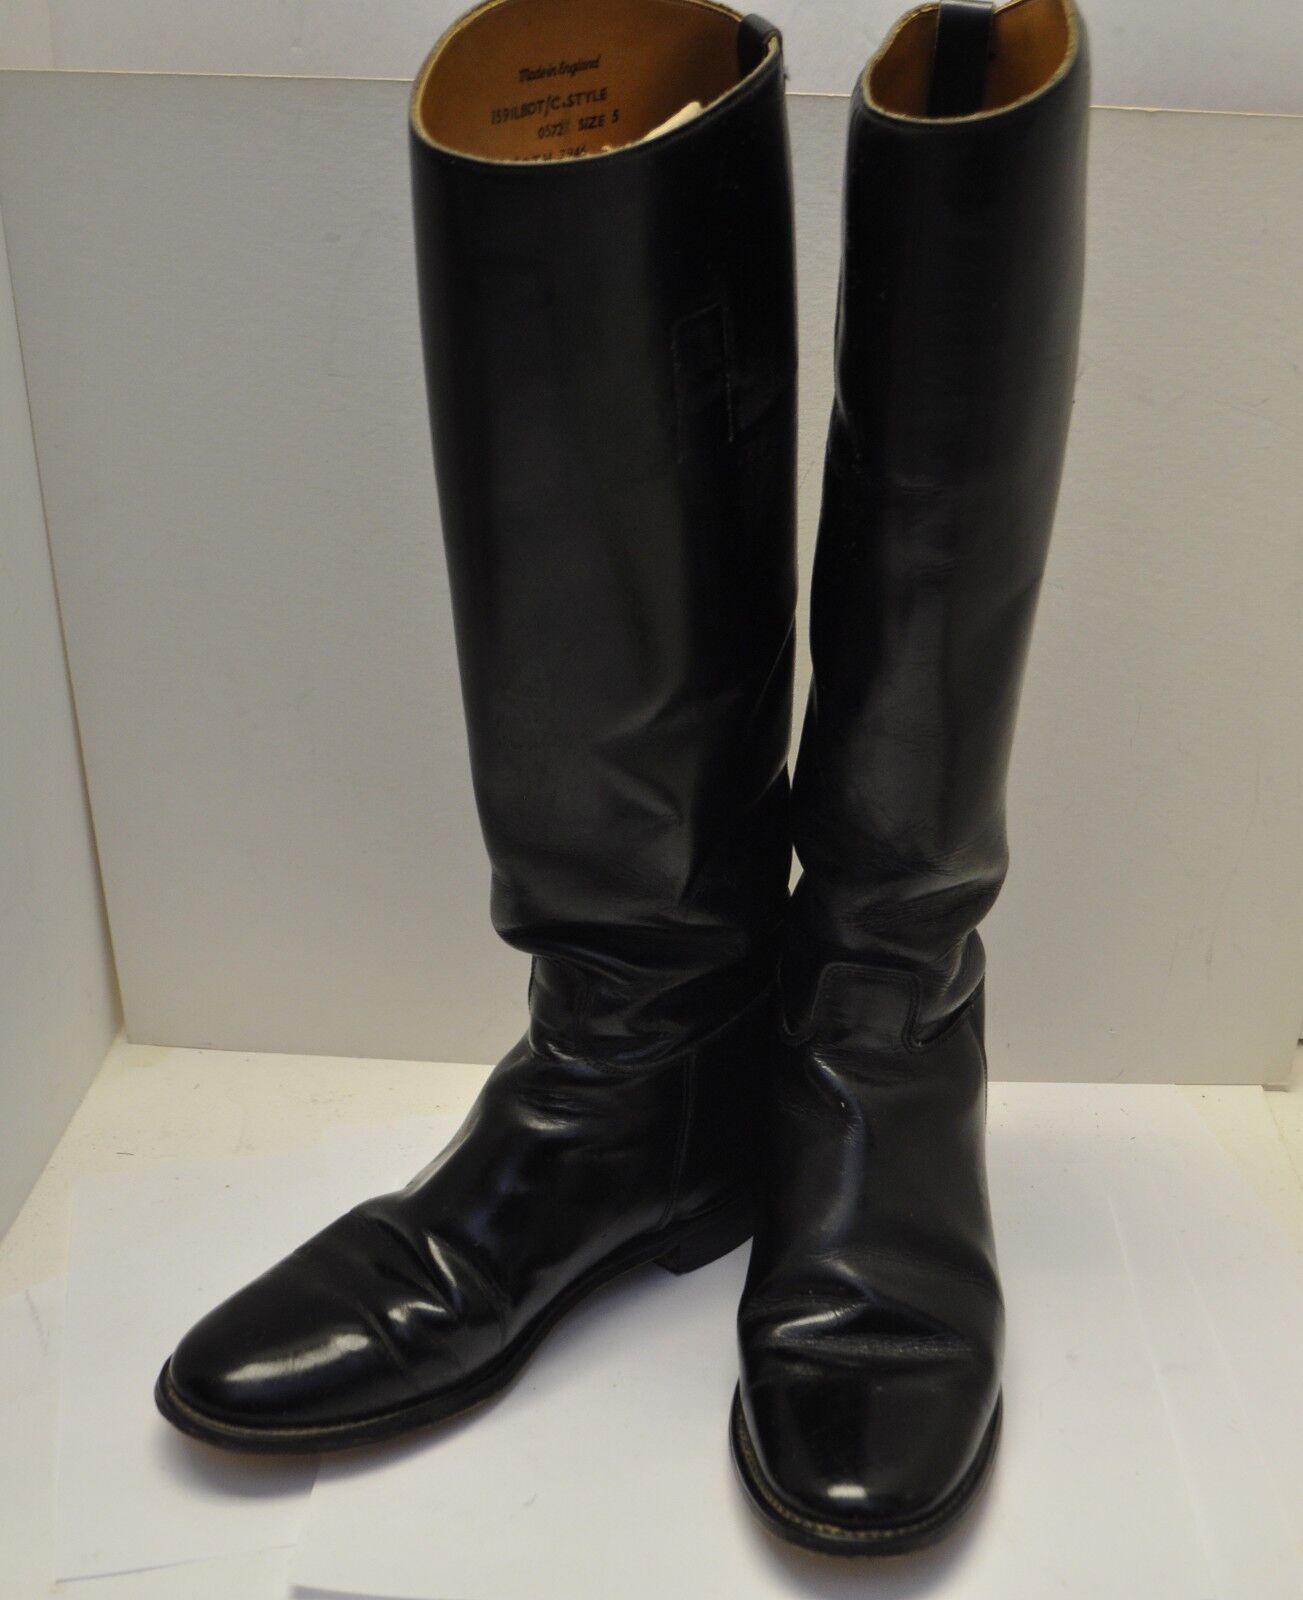 Vintage MARLBOROUGH Black Leather English Riding Boots Women's 5 US